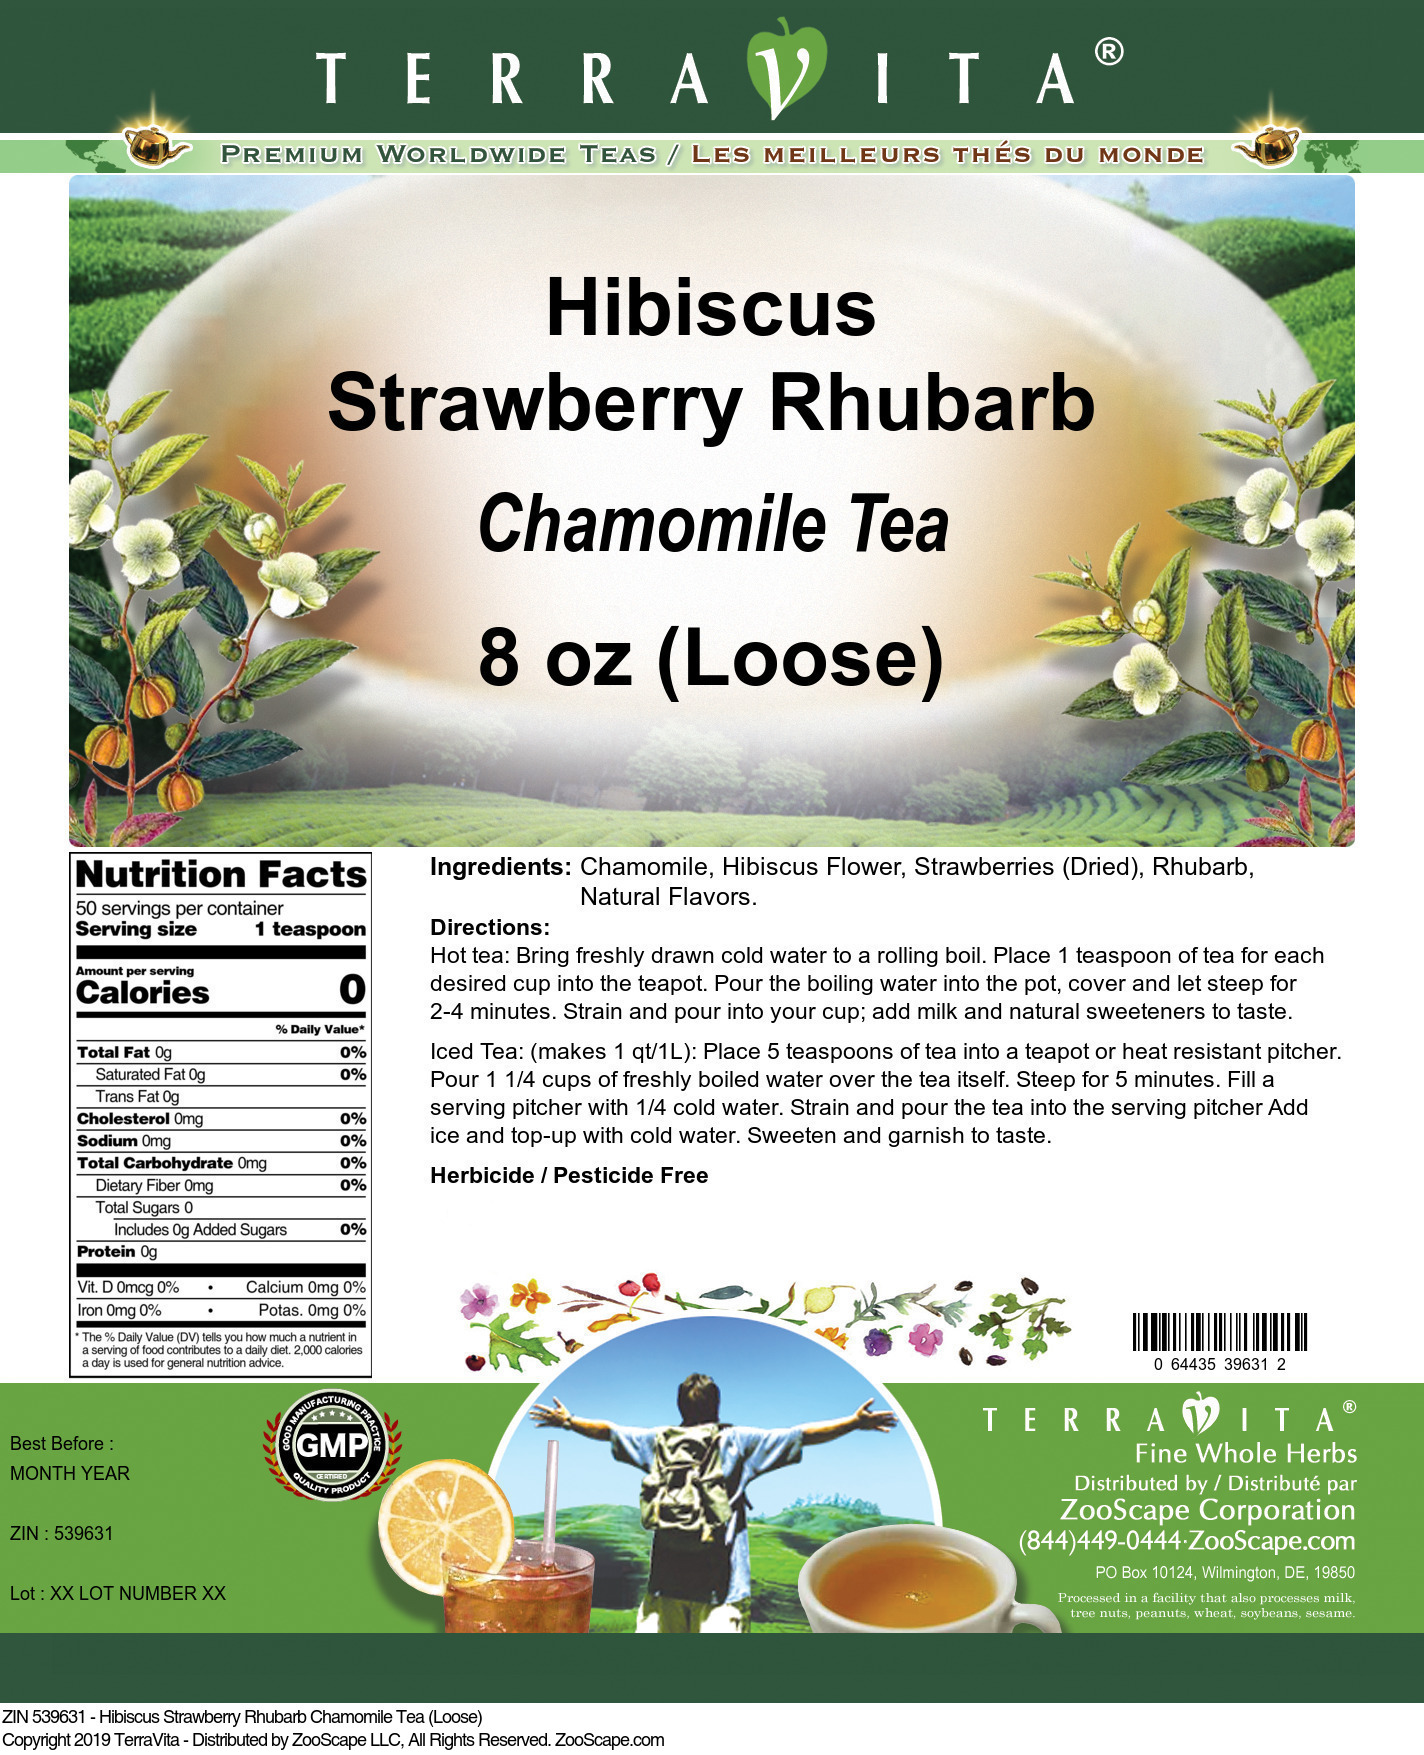 Hibiscus Strawberry Rhubarb Chamomile Tea